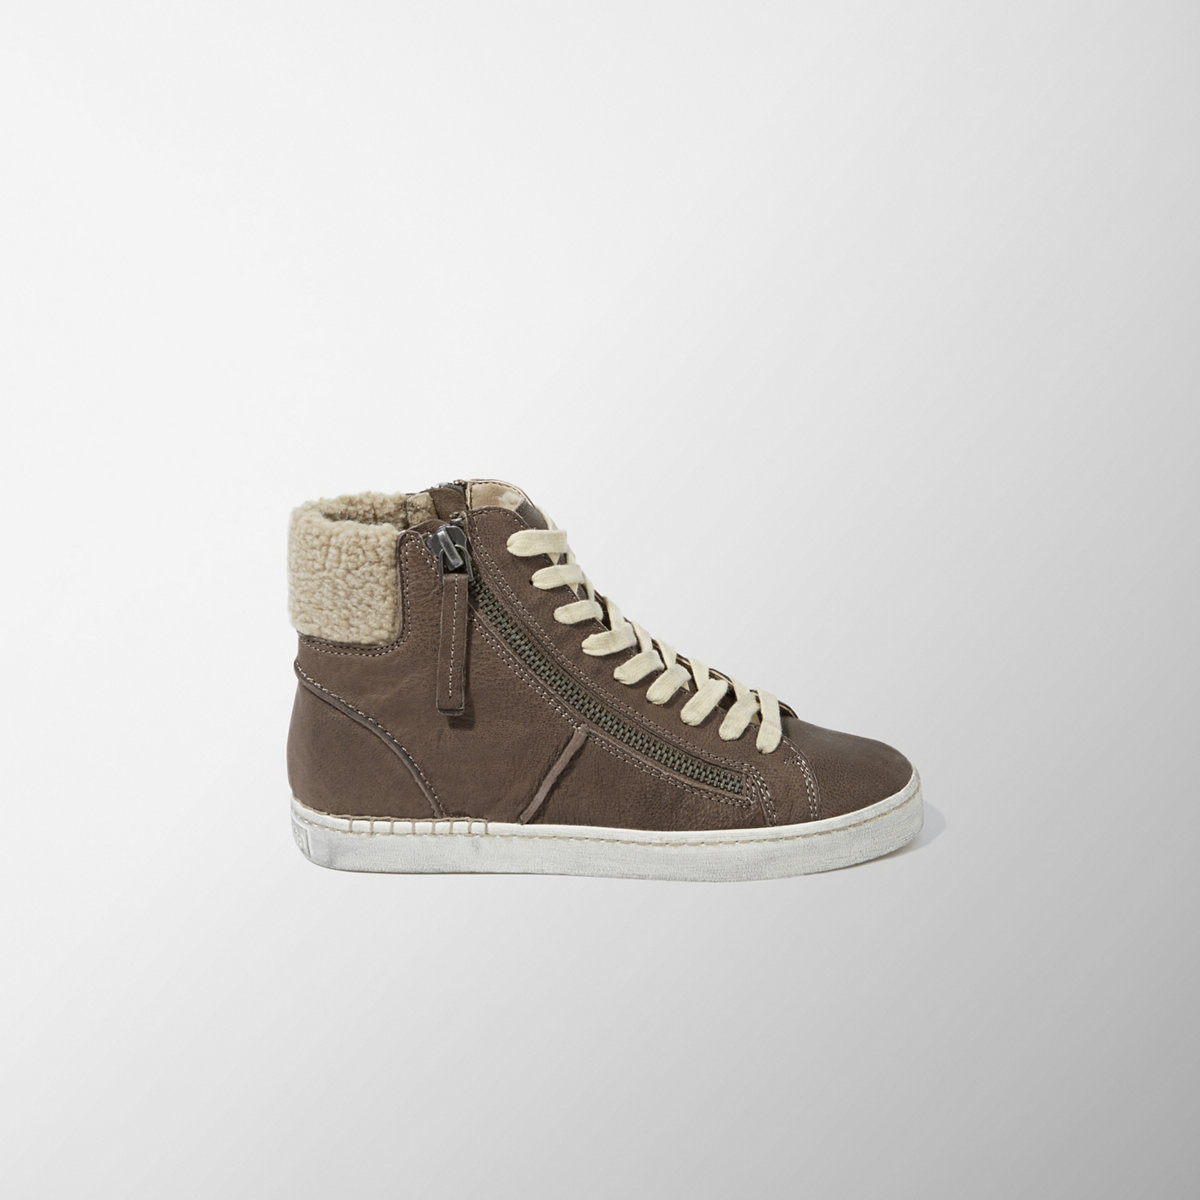 Dolce Vita Zola Sneakers